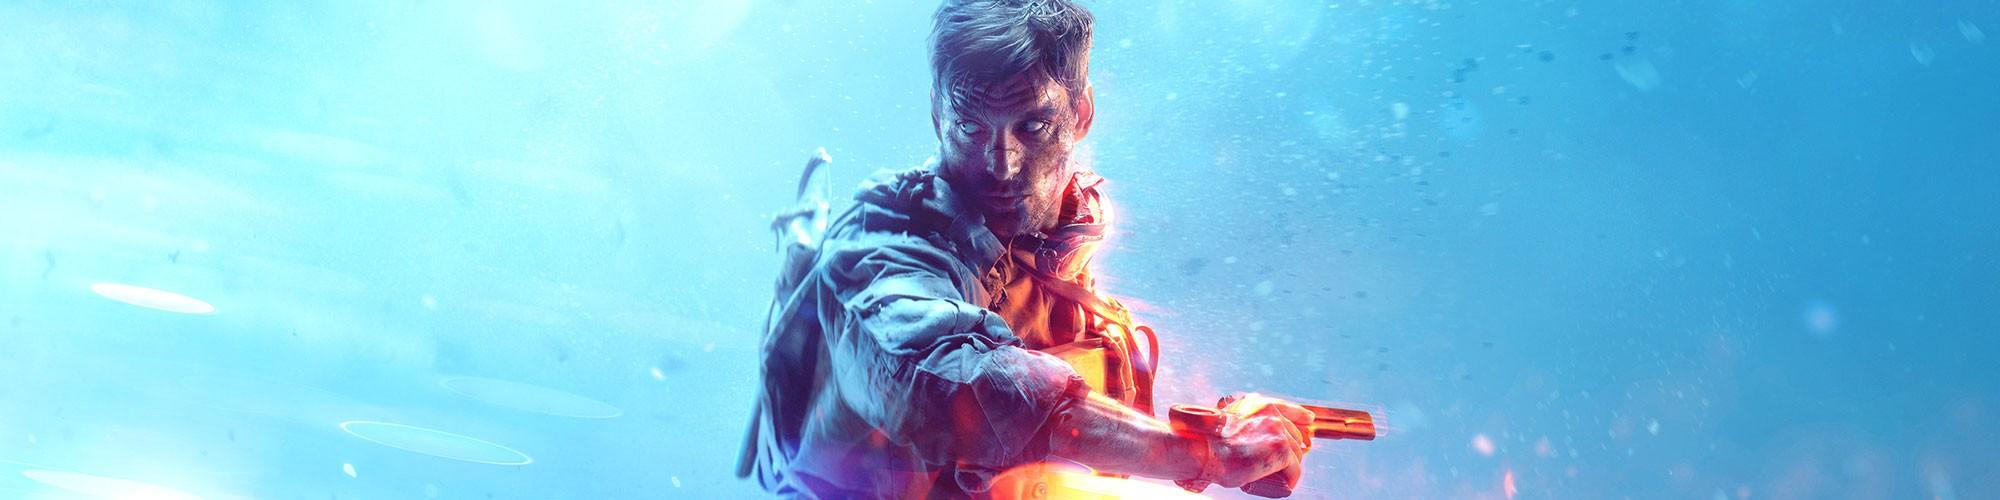 DLC for PC and Mac Games | Origin